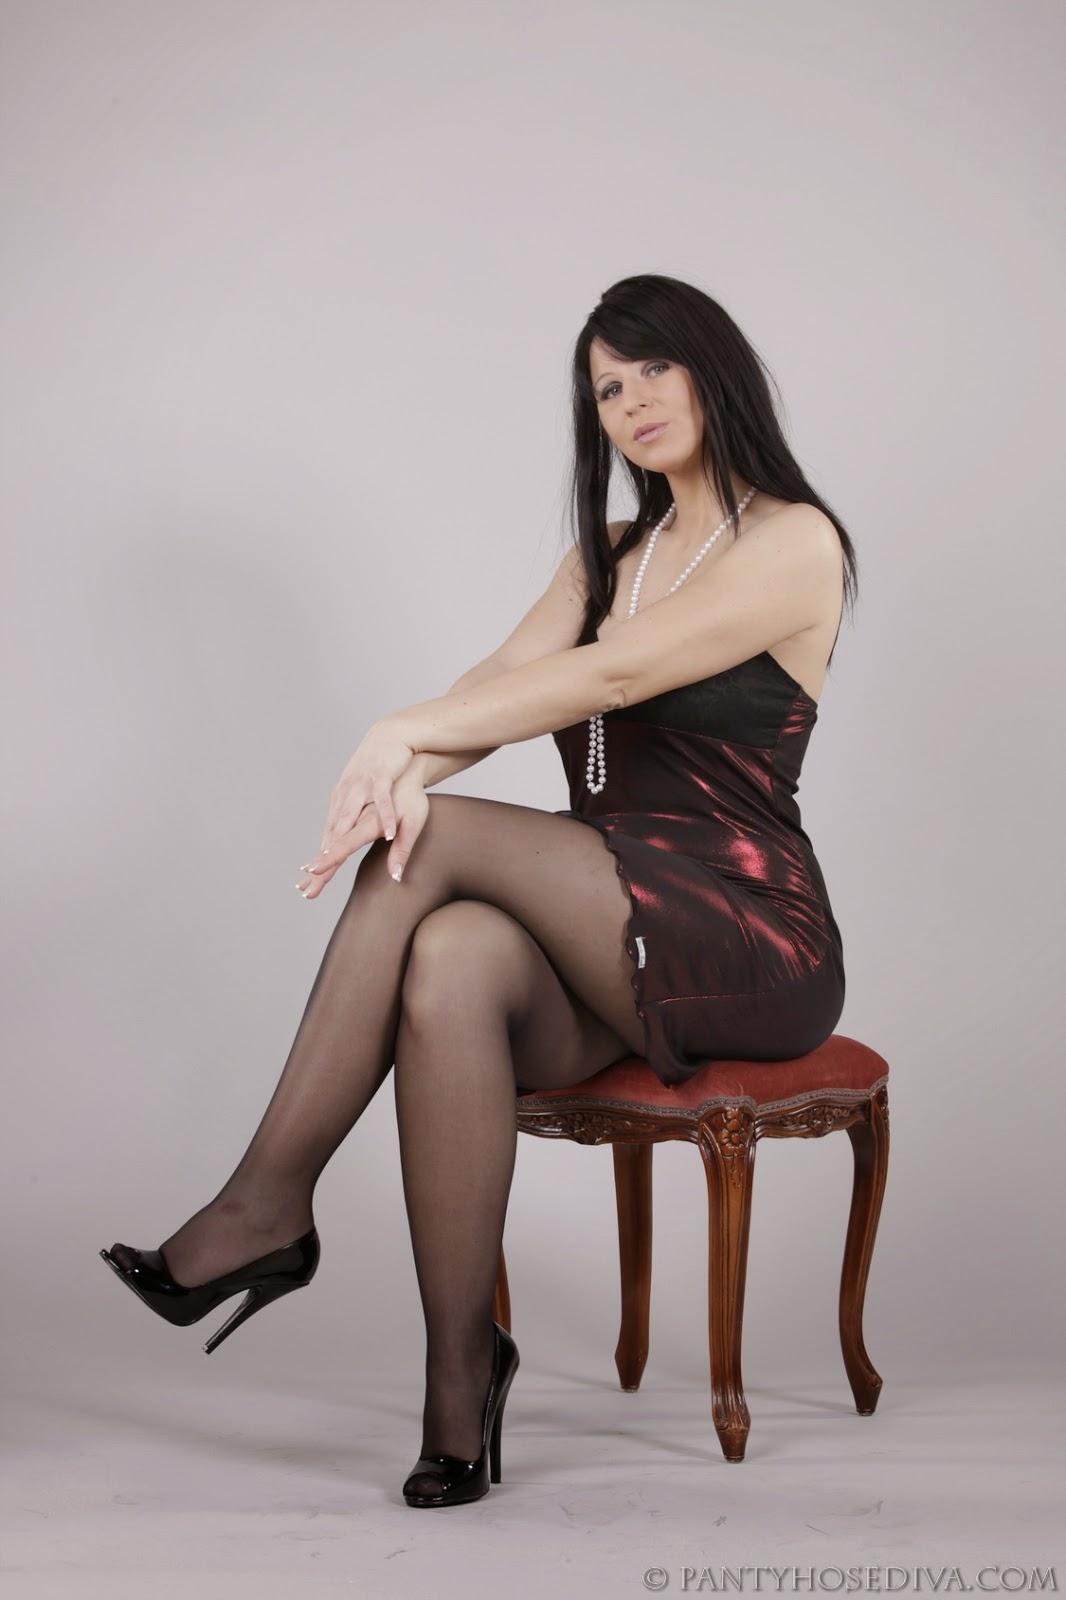 Mature Lovers Stunning Looking Pantyhose Diva Exposing -1004